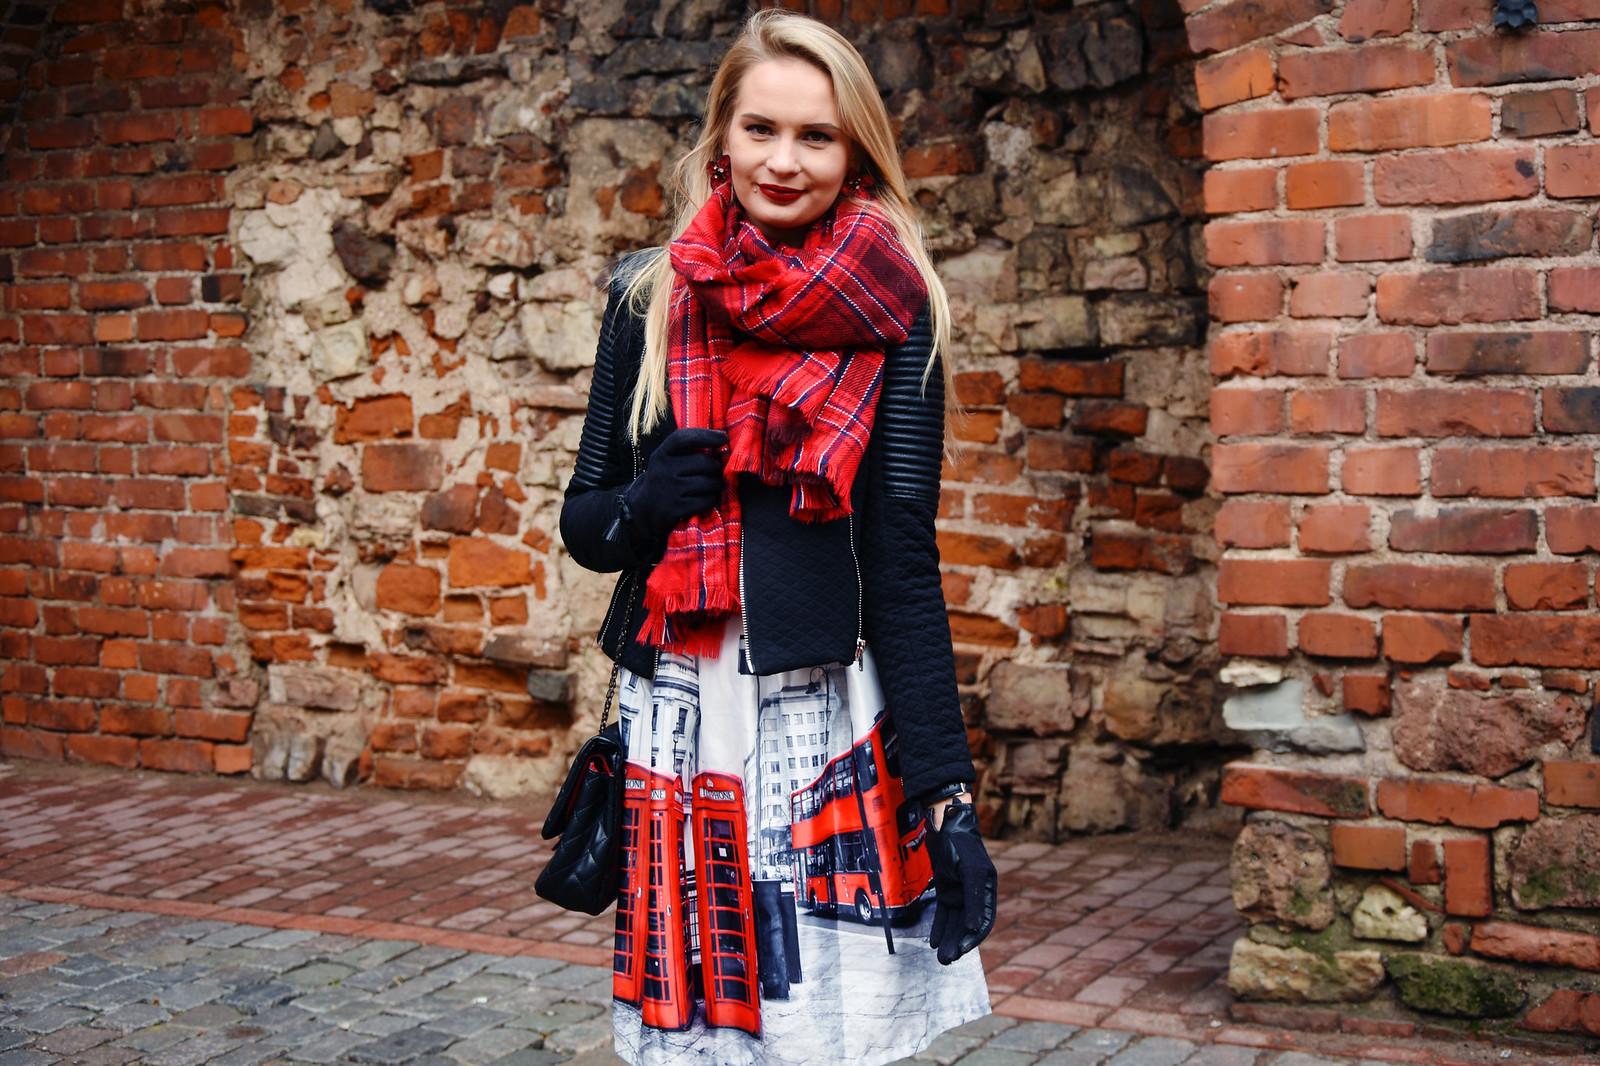 Styling a tartan scarf